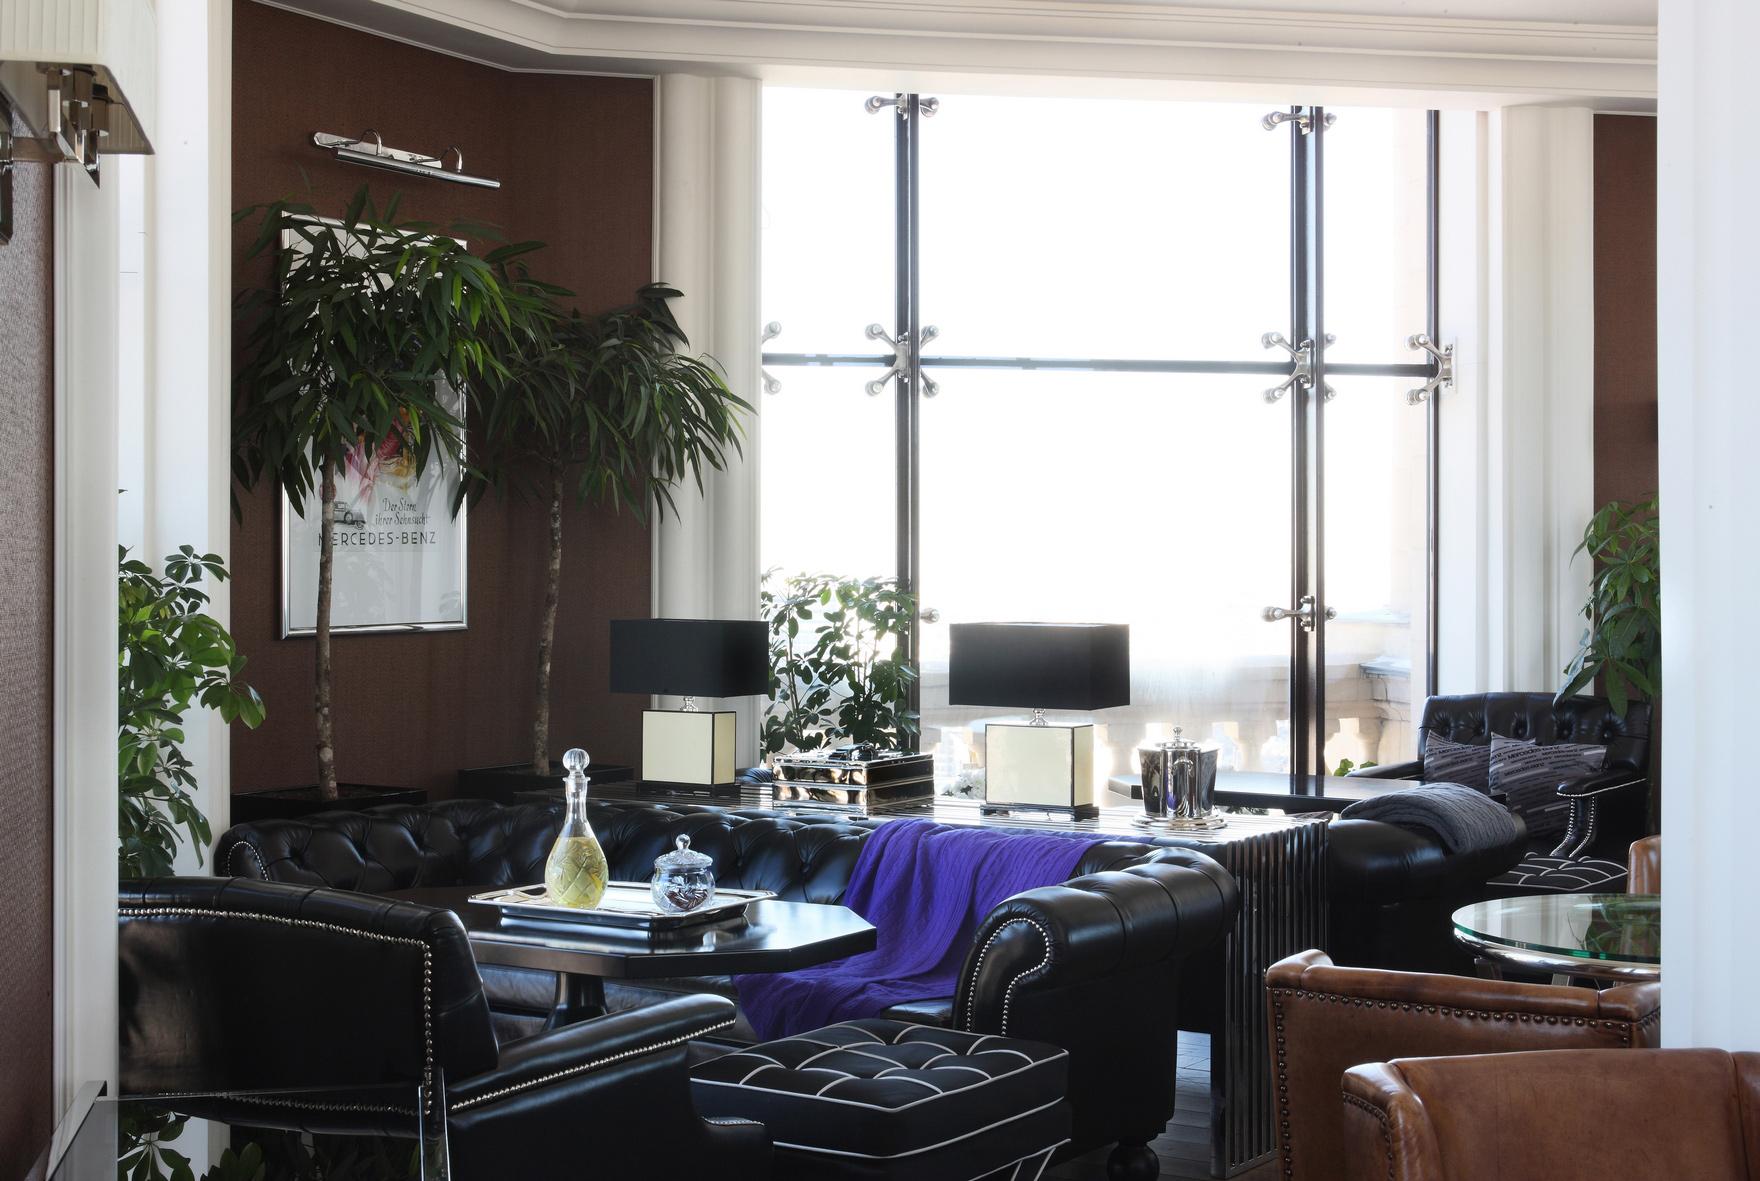 Фото ресторан, кафе, бар Дизайн офиса